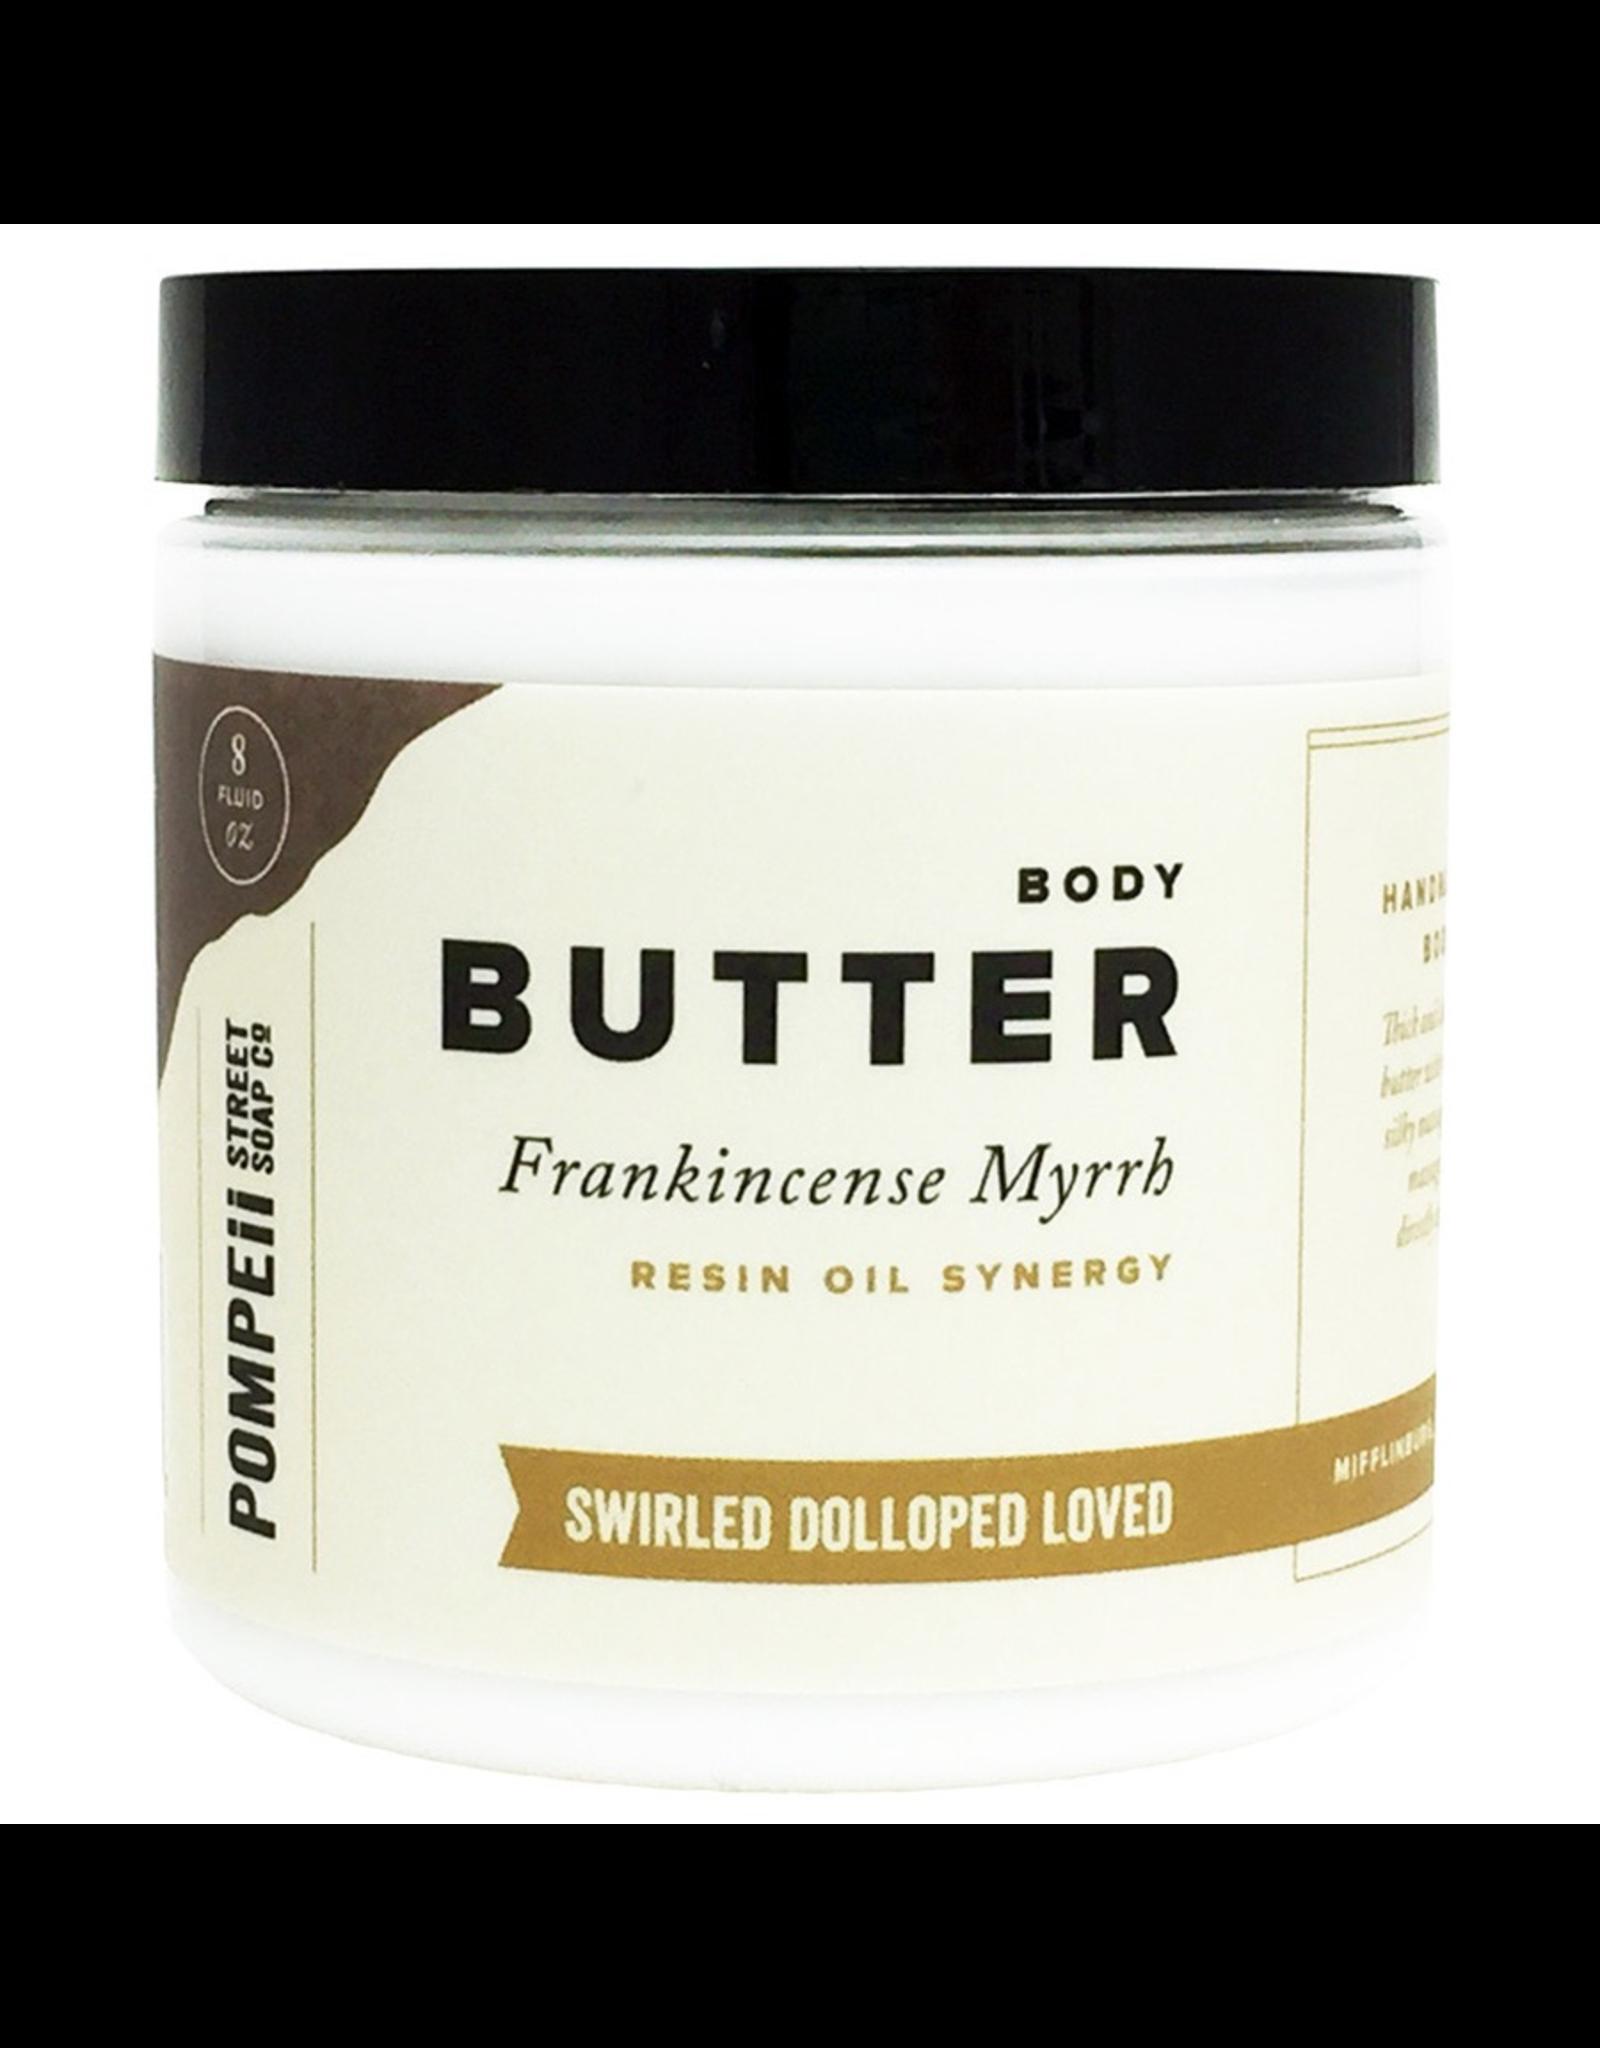 Pompeii Body Butter Frankincense Myrrh